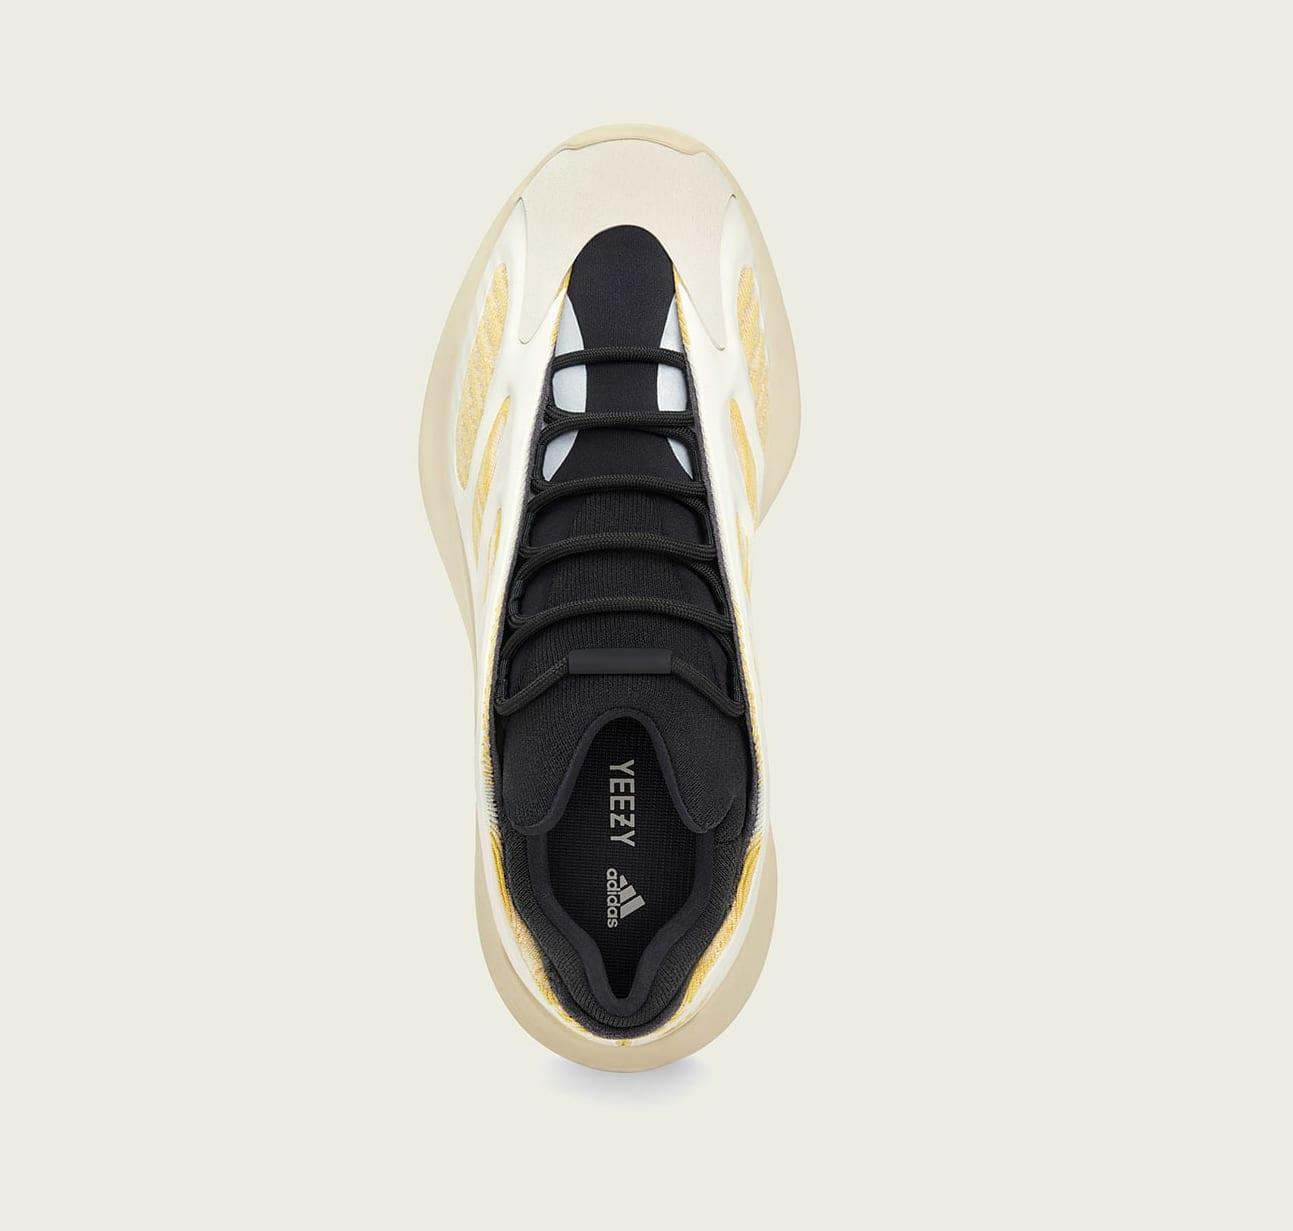 Adidas Yeezy 700 V3 'Safflower' G54853 Top